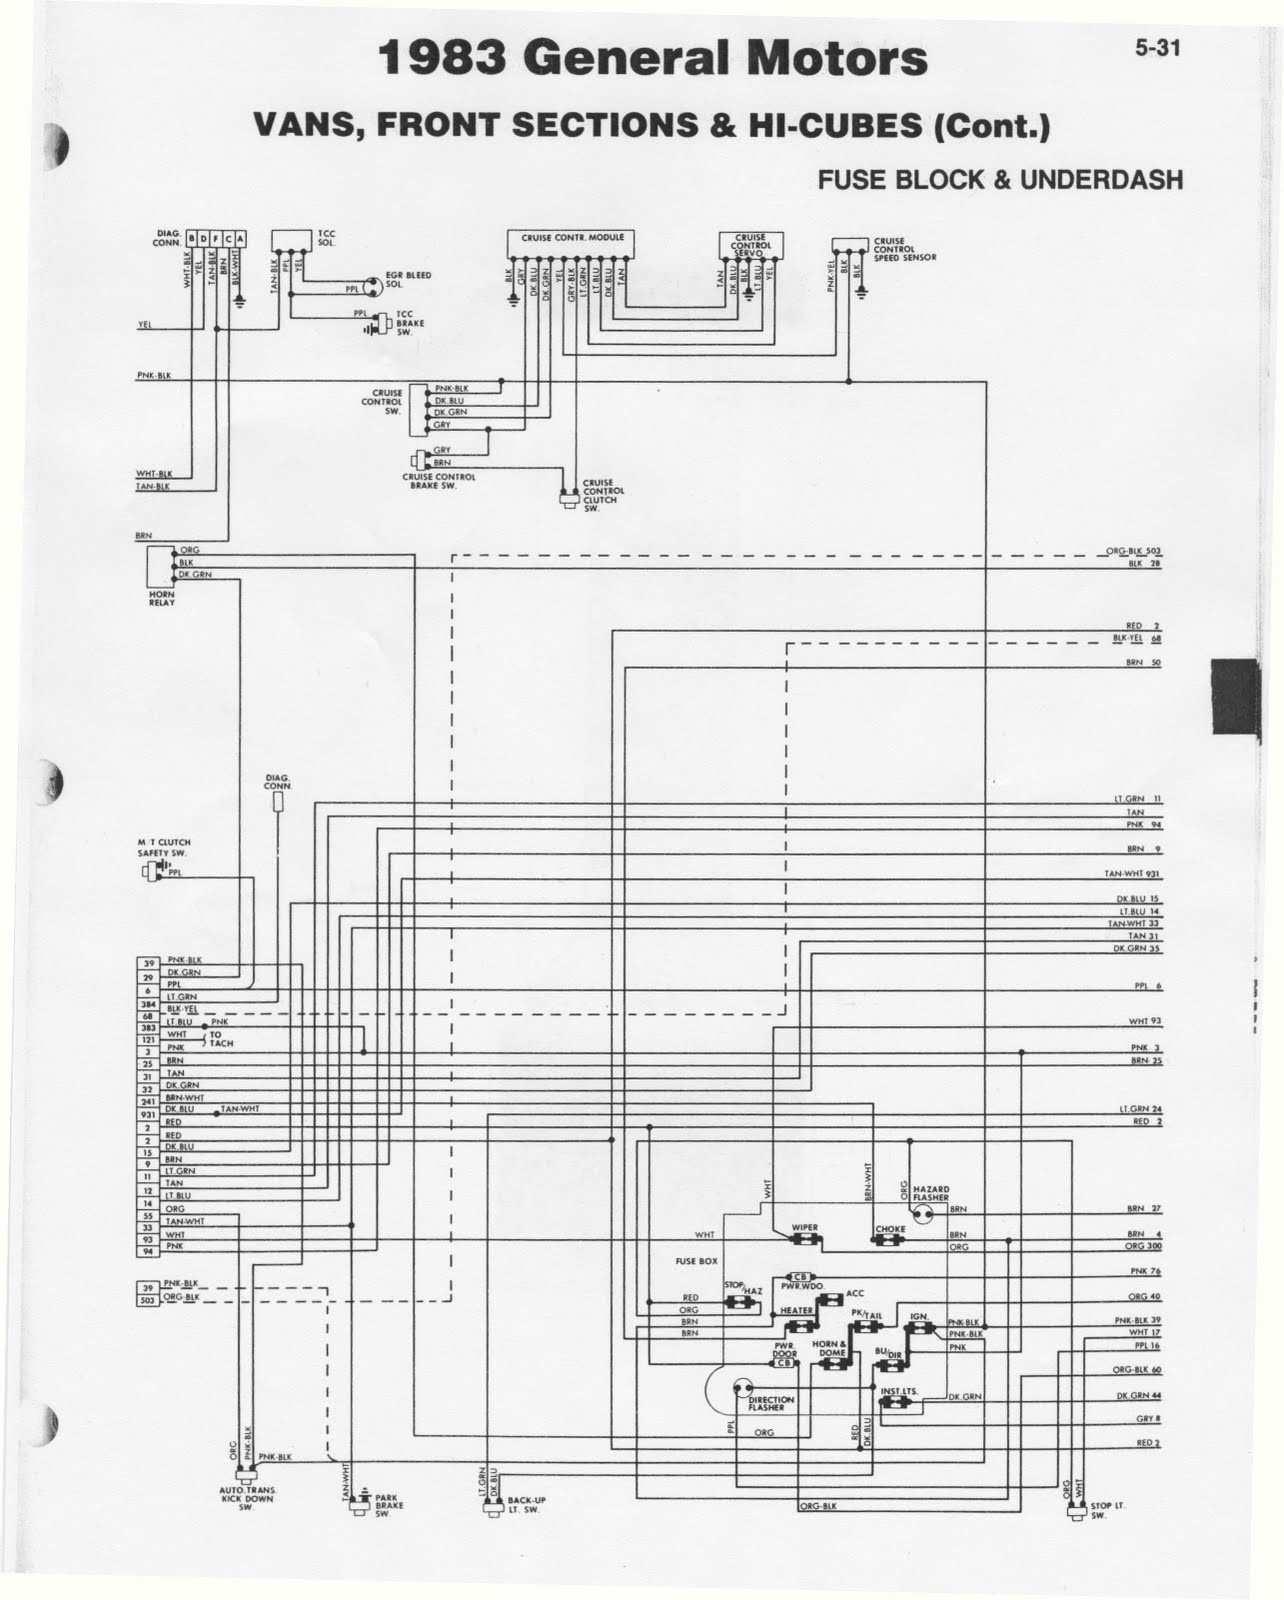 hight resolution of fleetwood rv wiring diagram 91 coronado schematic diagramfleetwood rv wiring diagram 91 coronado wiring diagram fleetwood